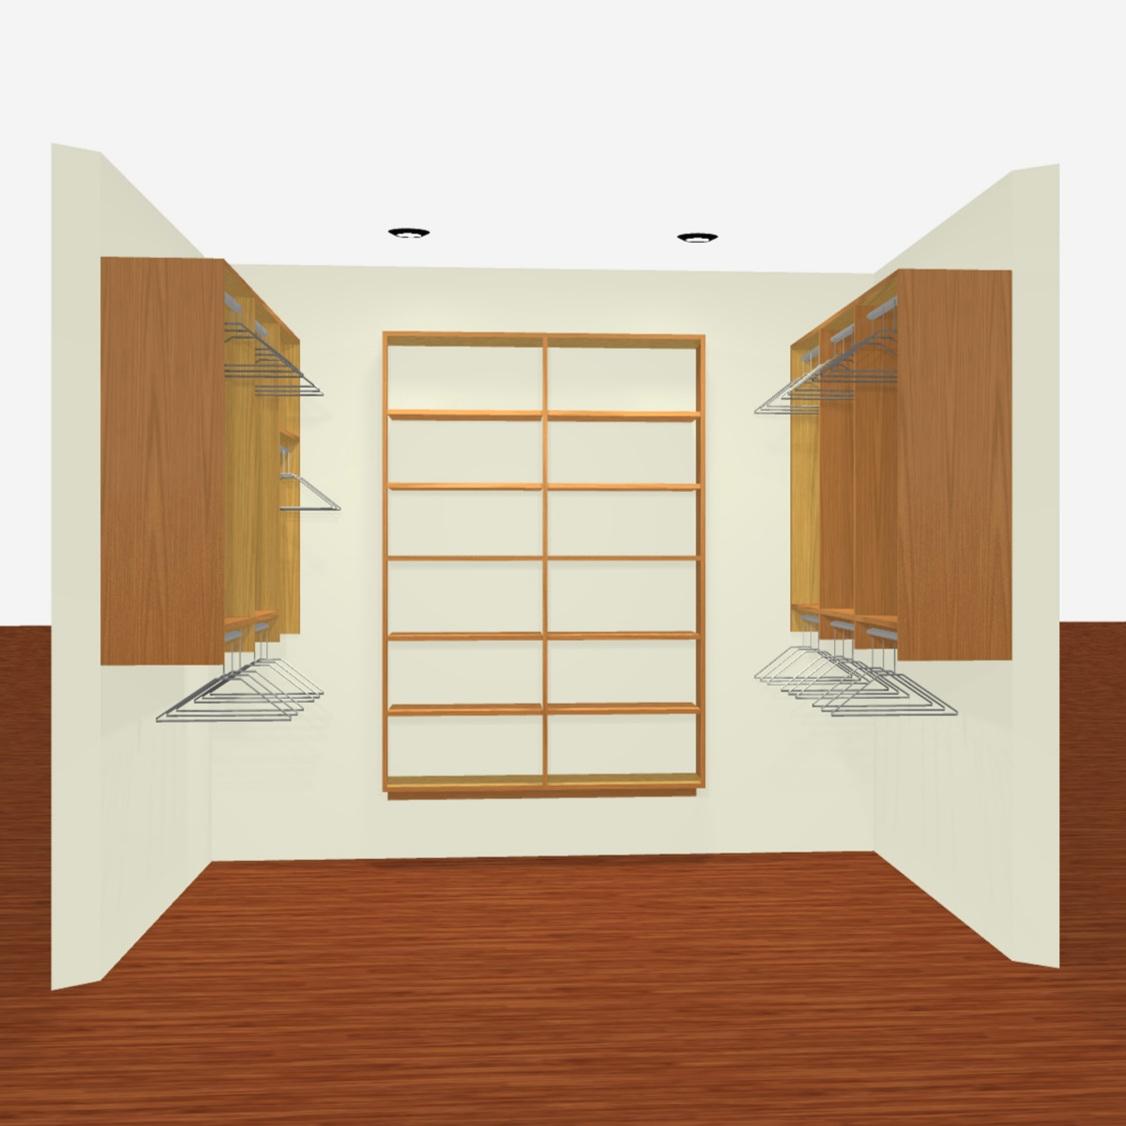 3D Render - Basic Walk-In Closet